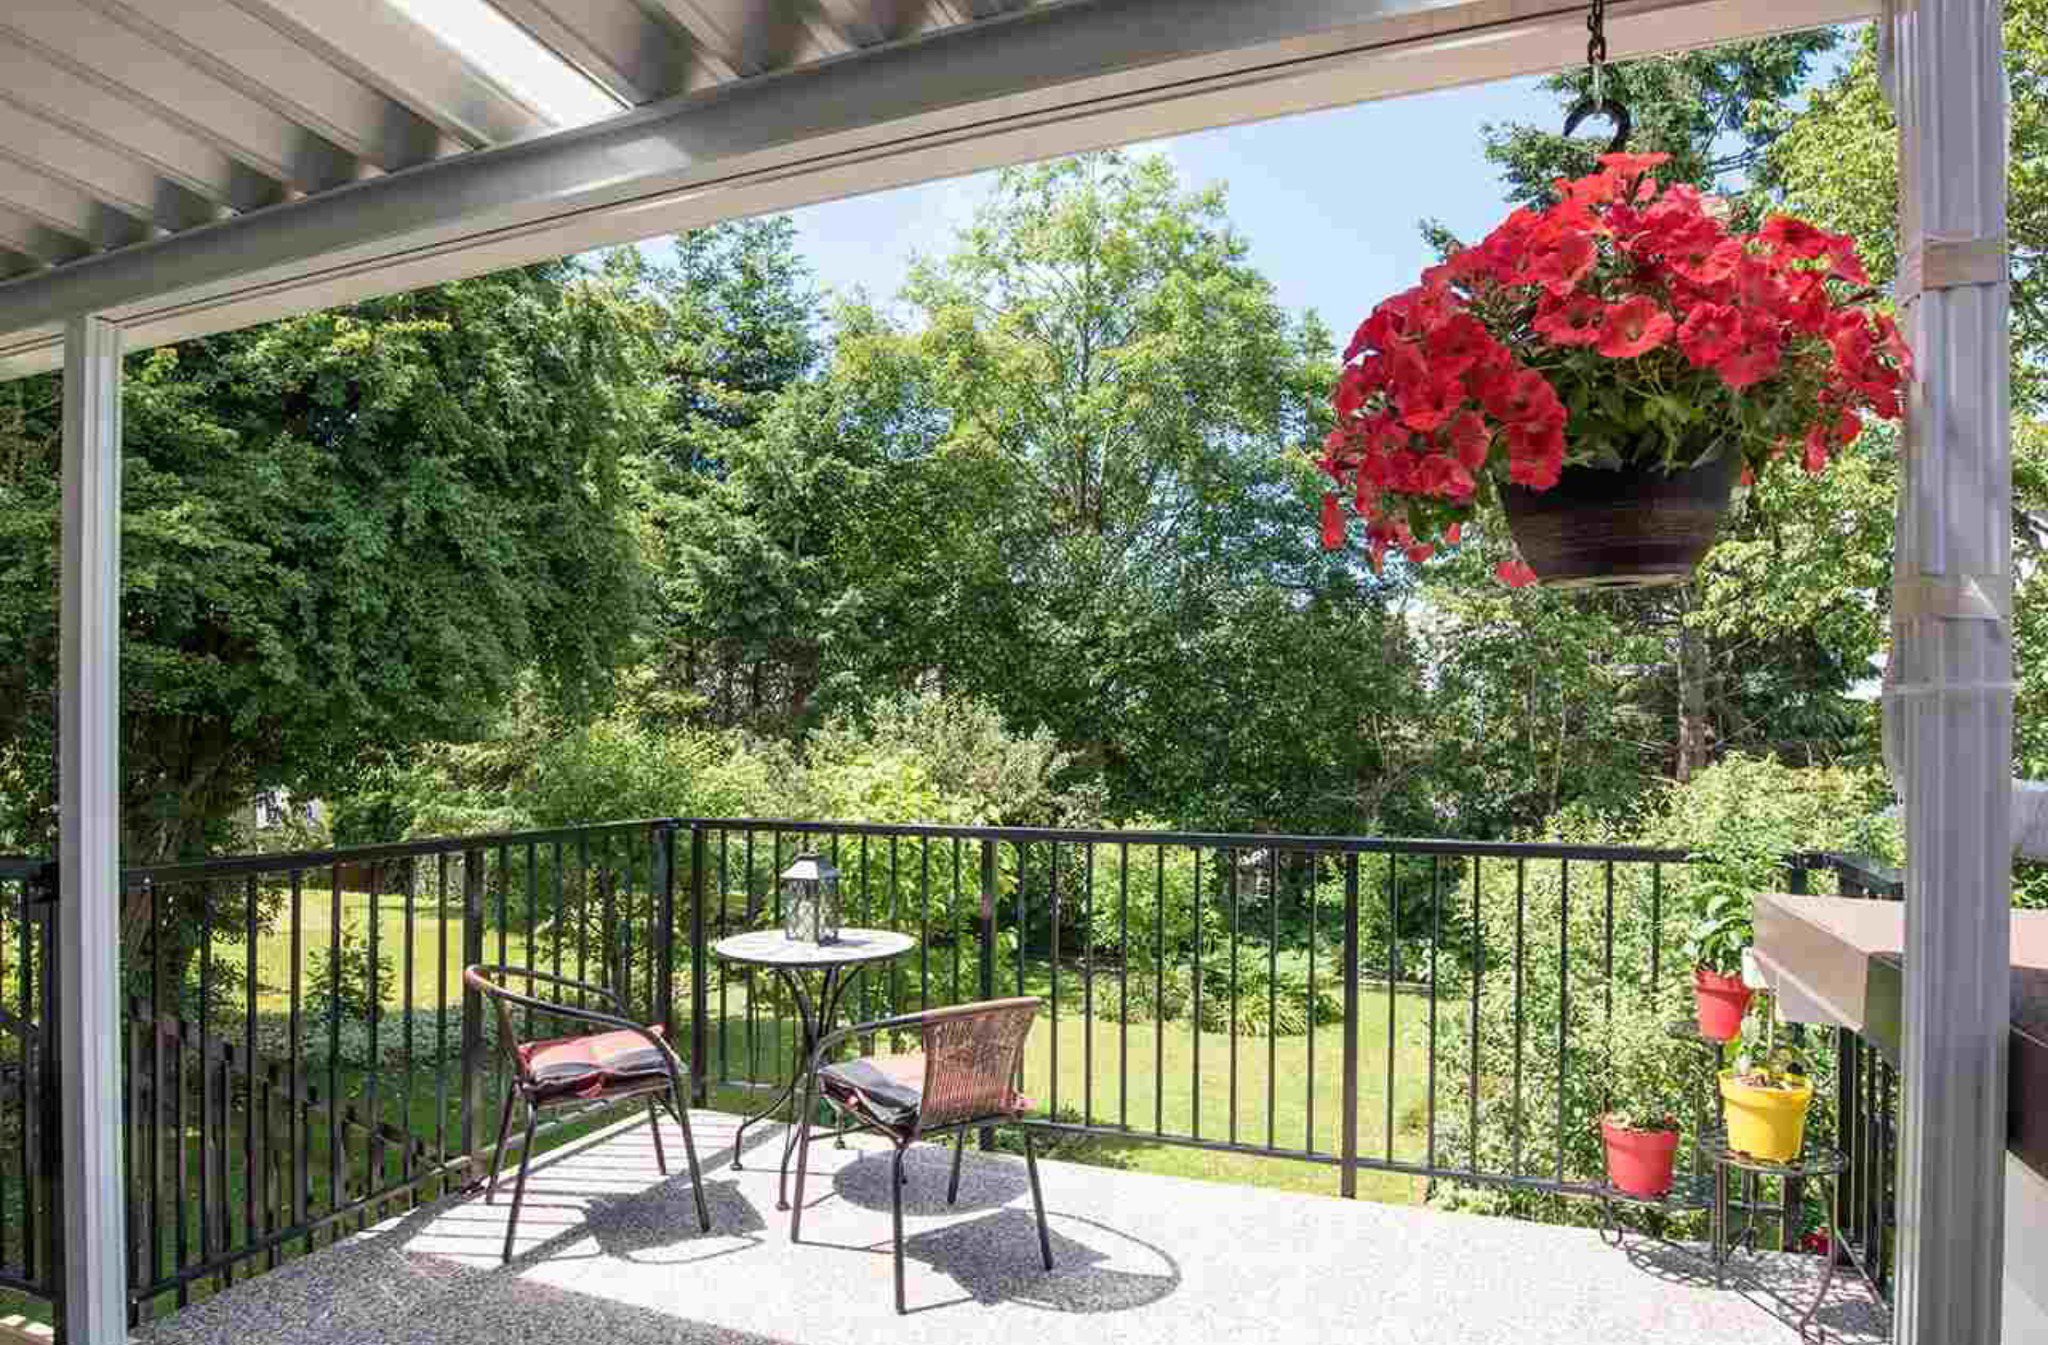 Photo 12: Photos: 10327 127A Street in Surrey: Cedar Hills House for sale : MLS®# R2178137